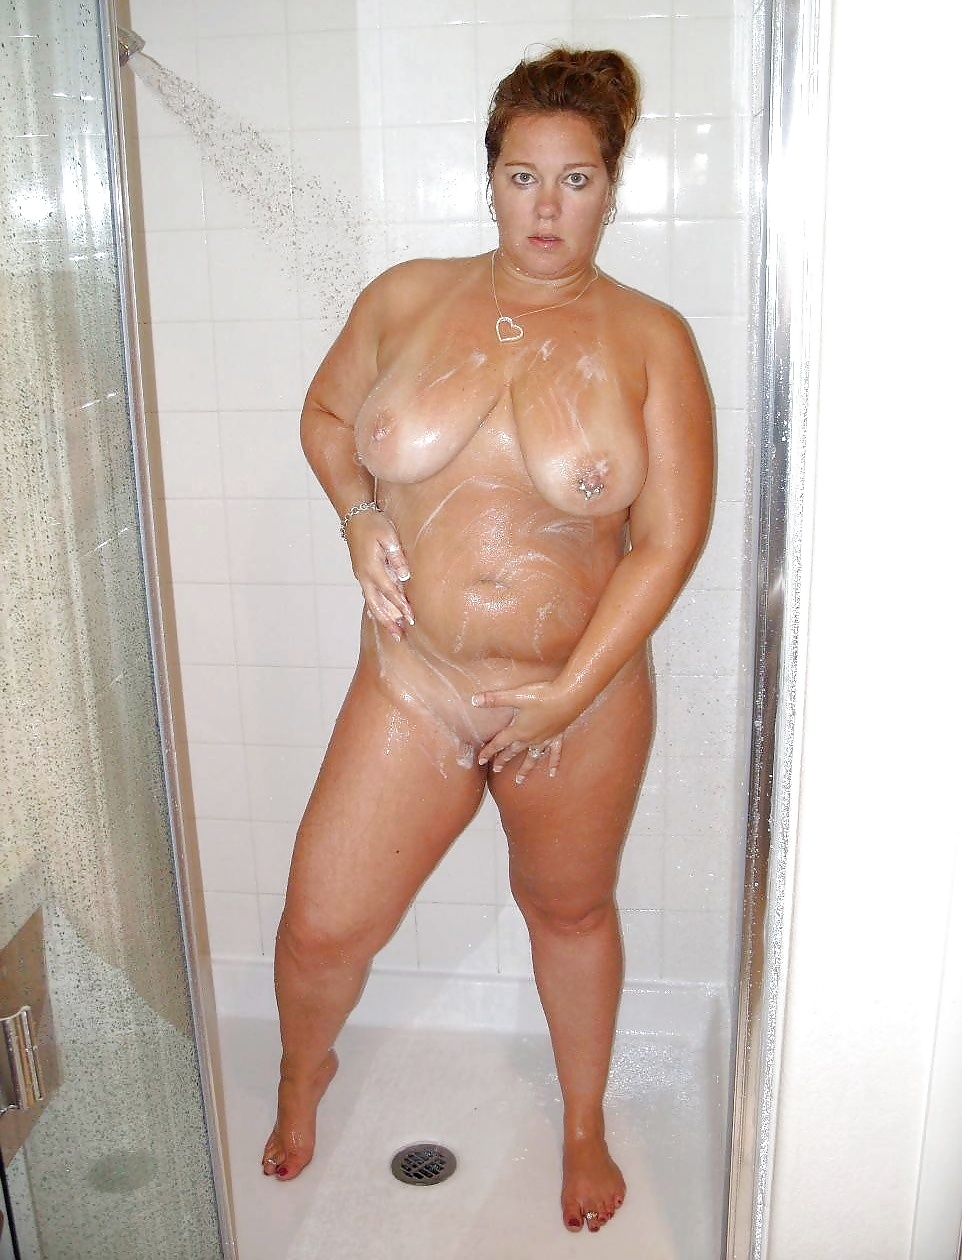 Old women shower pics